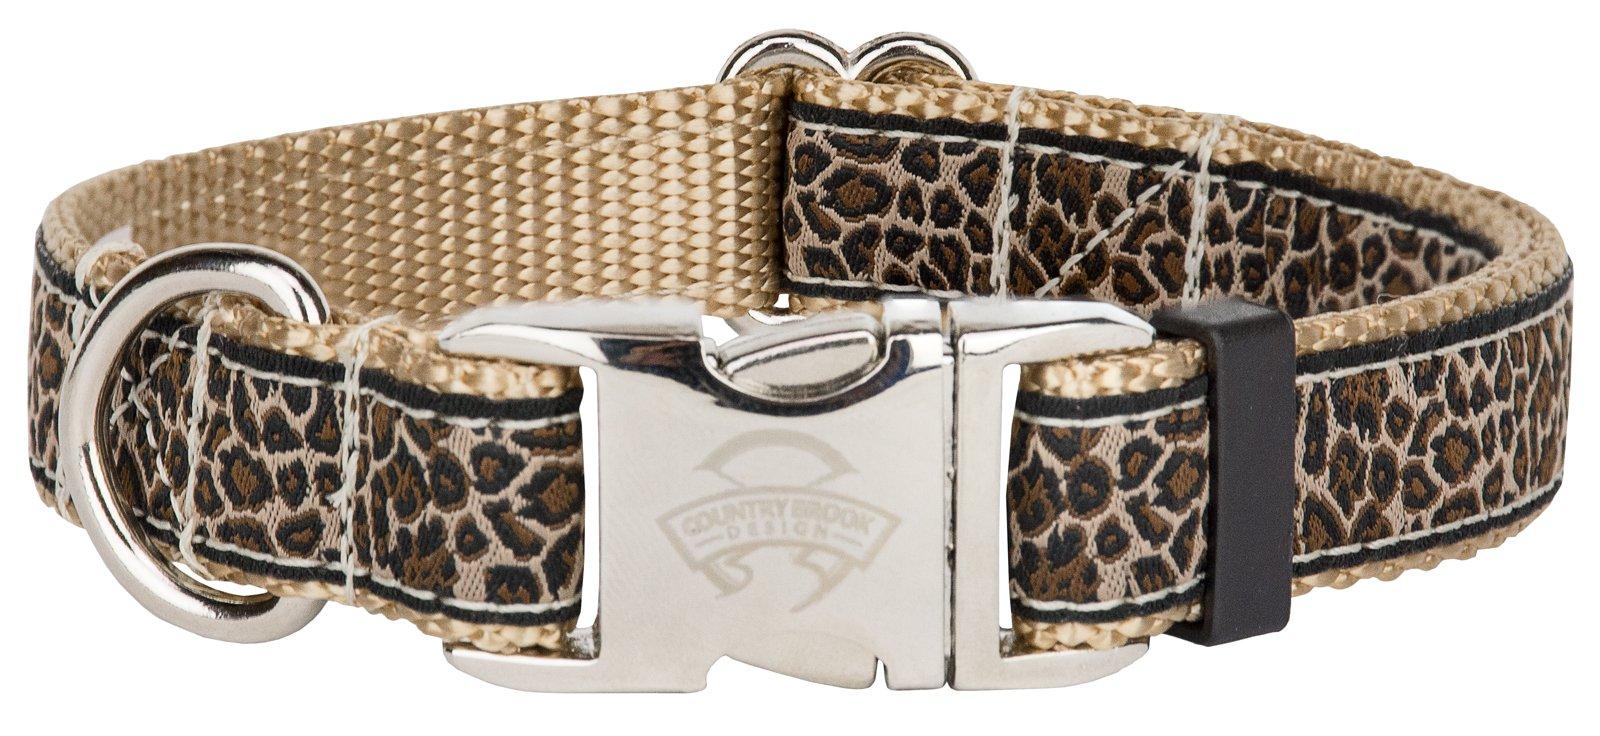 Country Brook Design Premium Leopard Print Ribbon Dog Collar Limited Edition - Medium